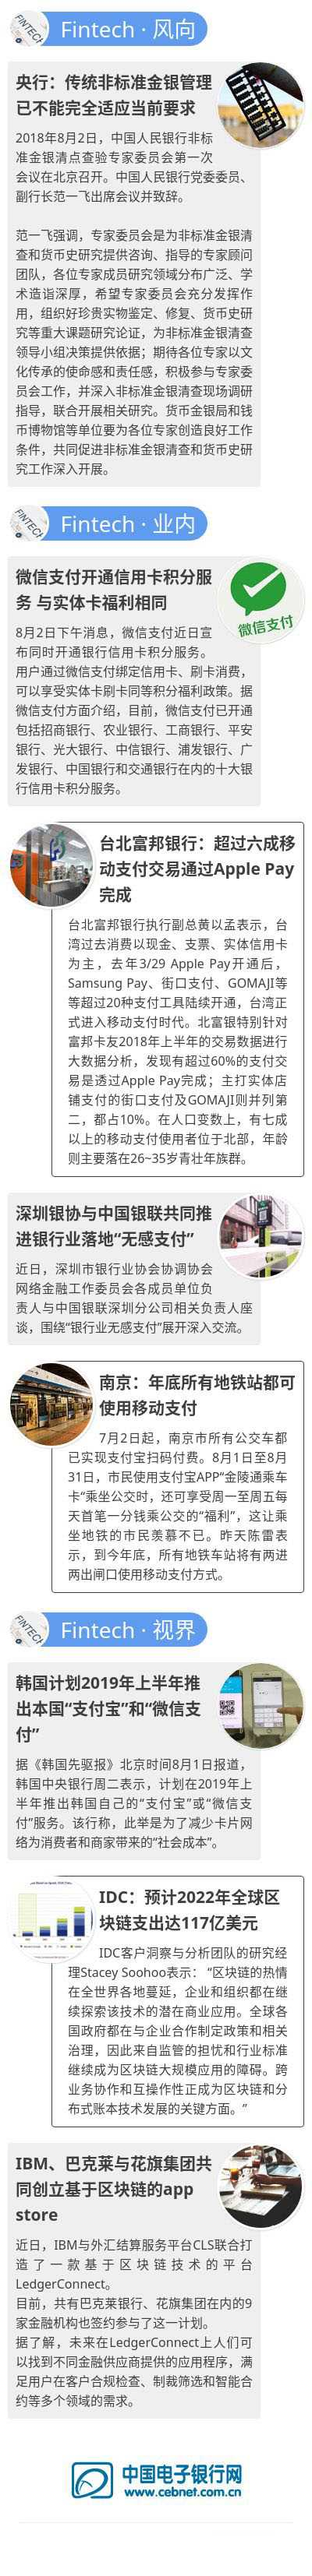 【Fintech日报】微信开同信用卡积分;银联深圳推行无感支付